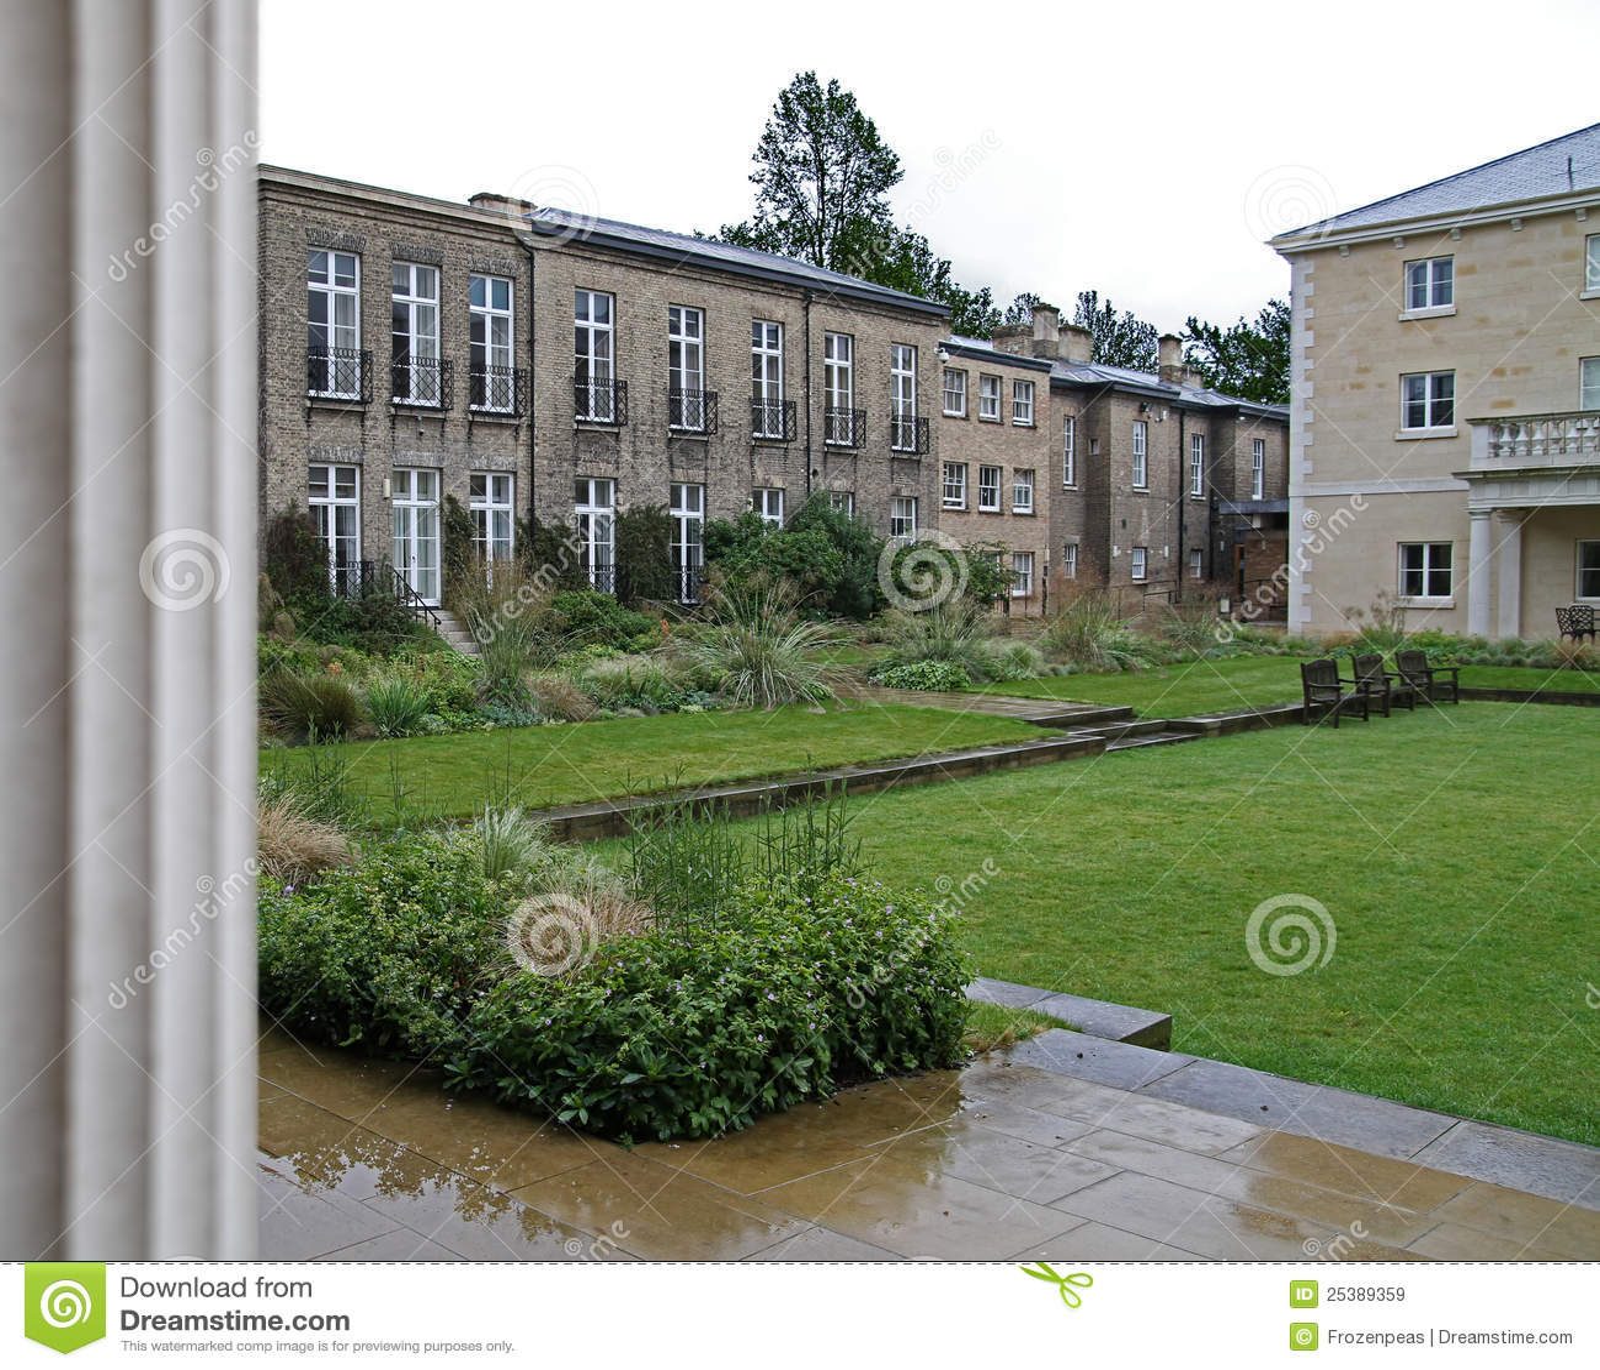 English Architecture Royalty Free Stock Images - Image: 25389359